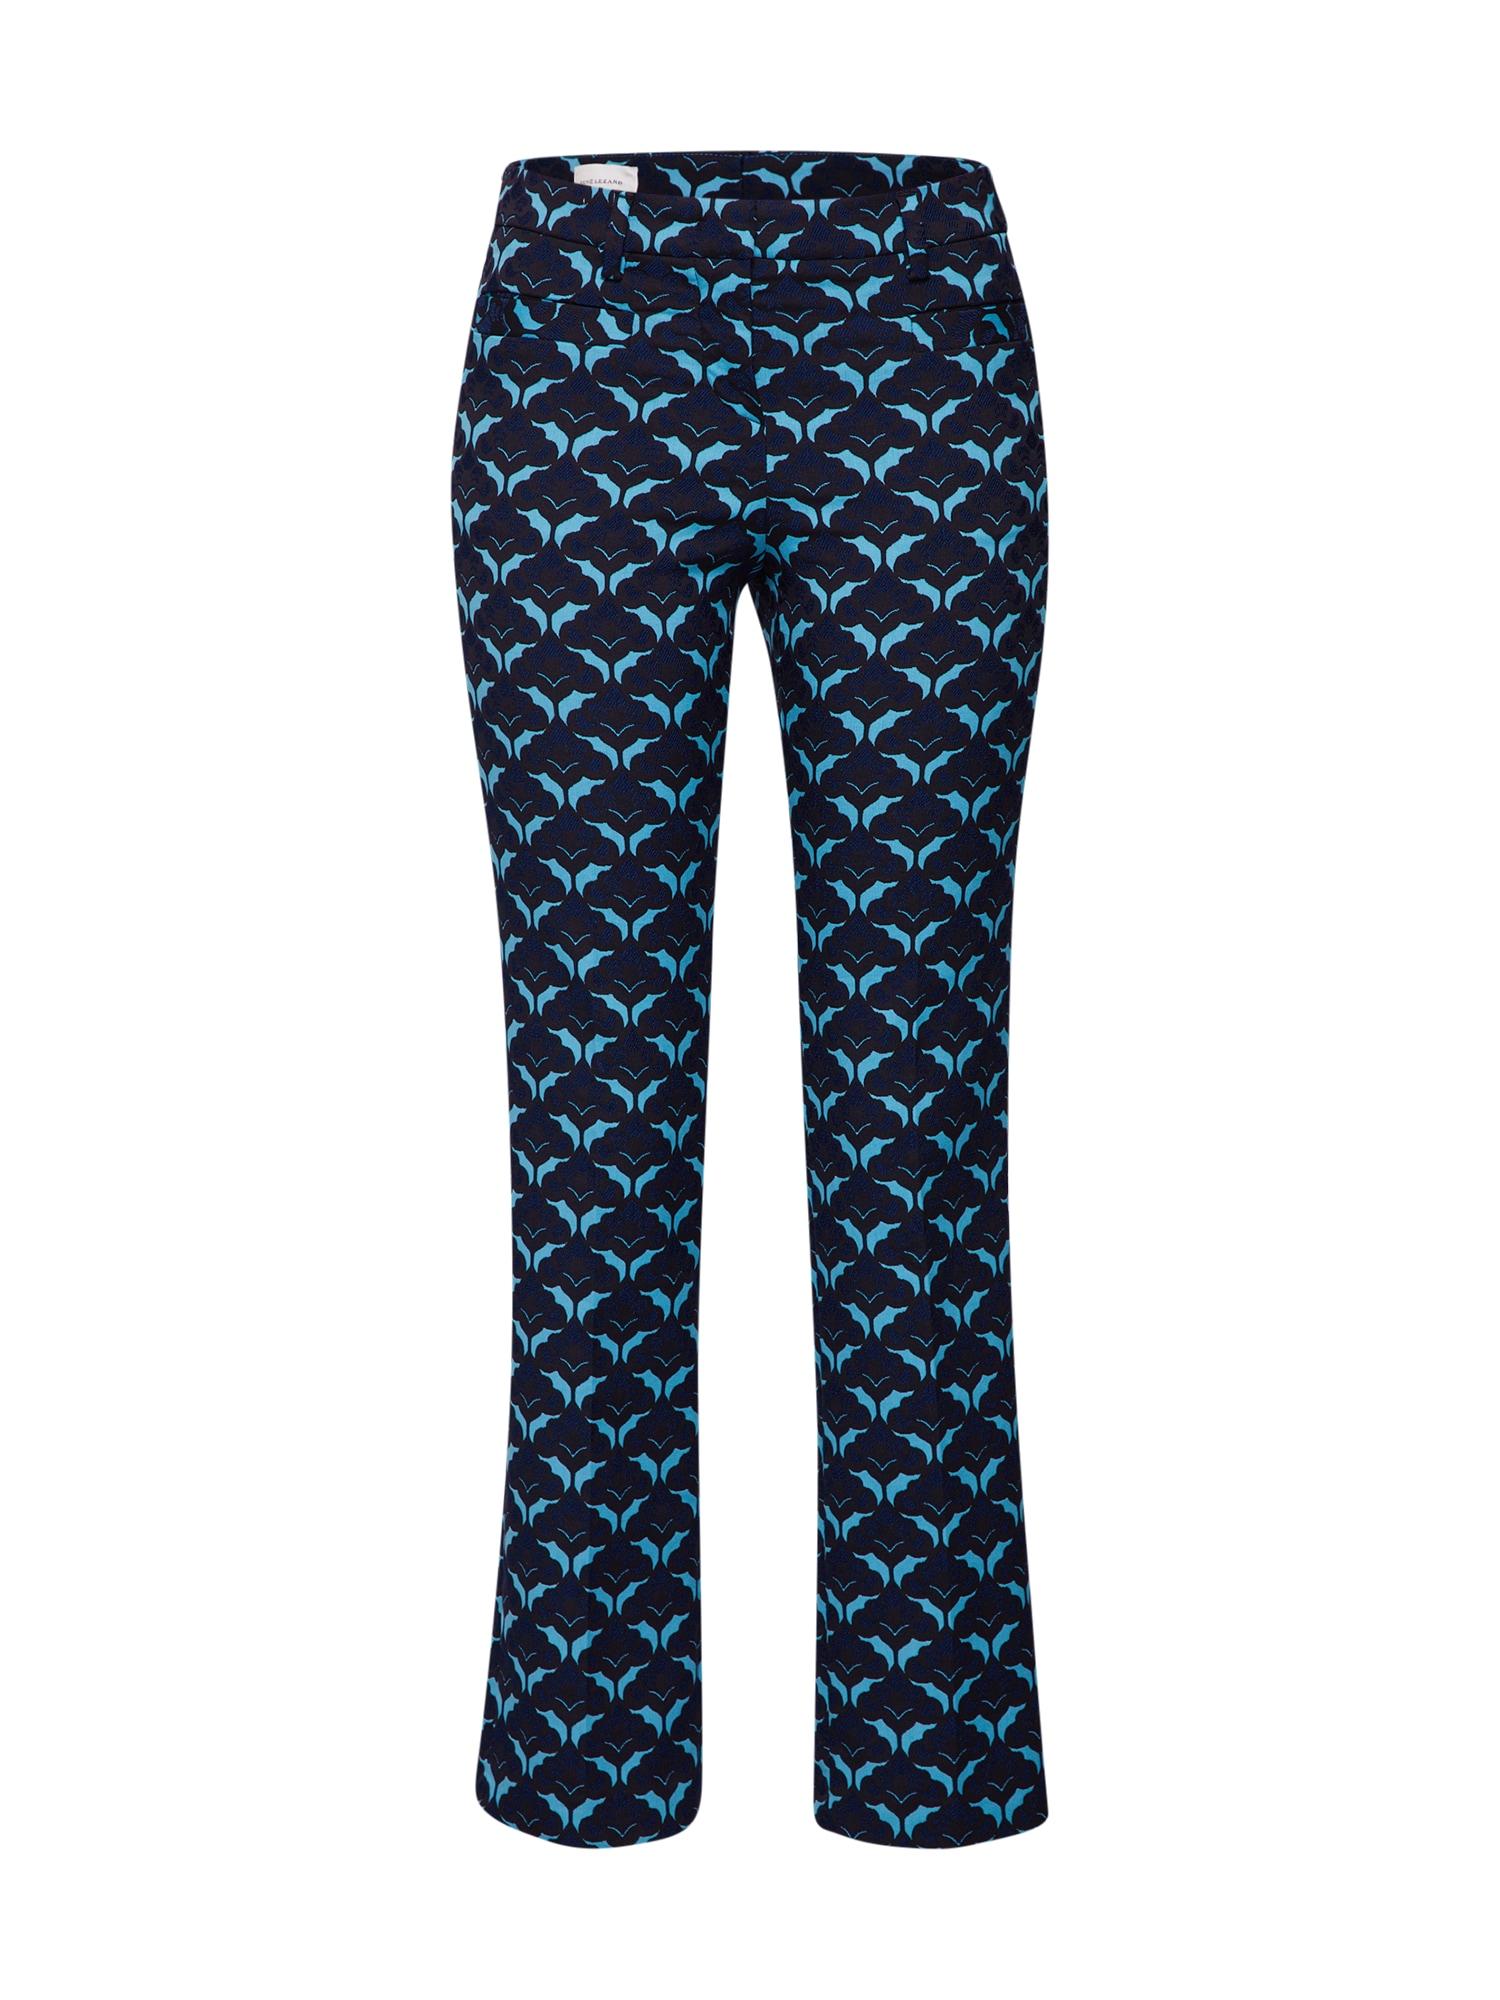 RENÉ LEZARD Kelnės 'F039S' turkio spalva / ultramarino mėlyna (skaidri)